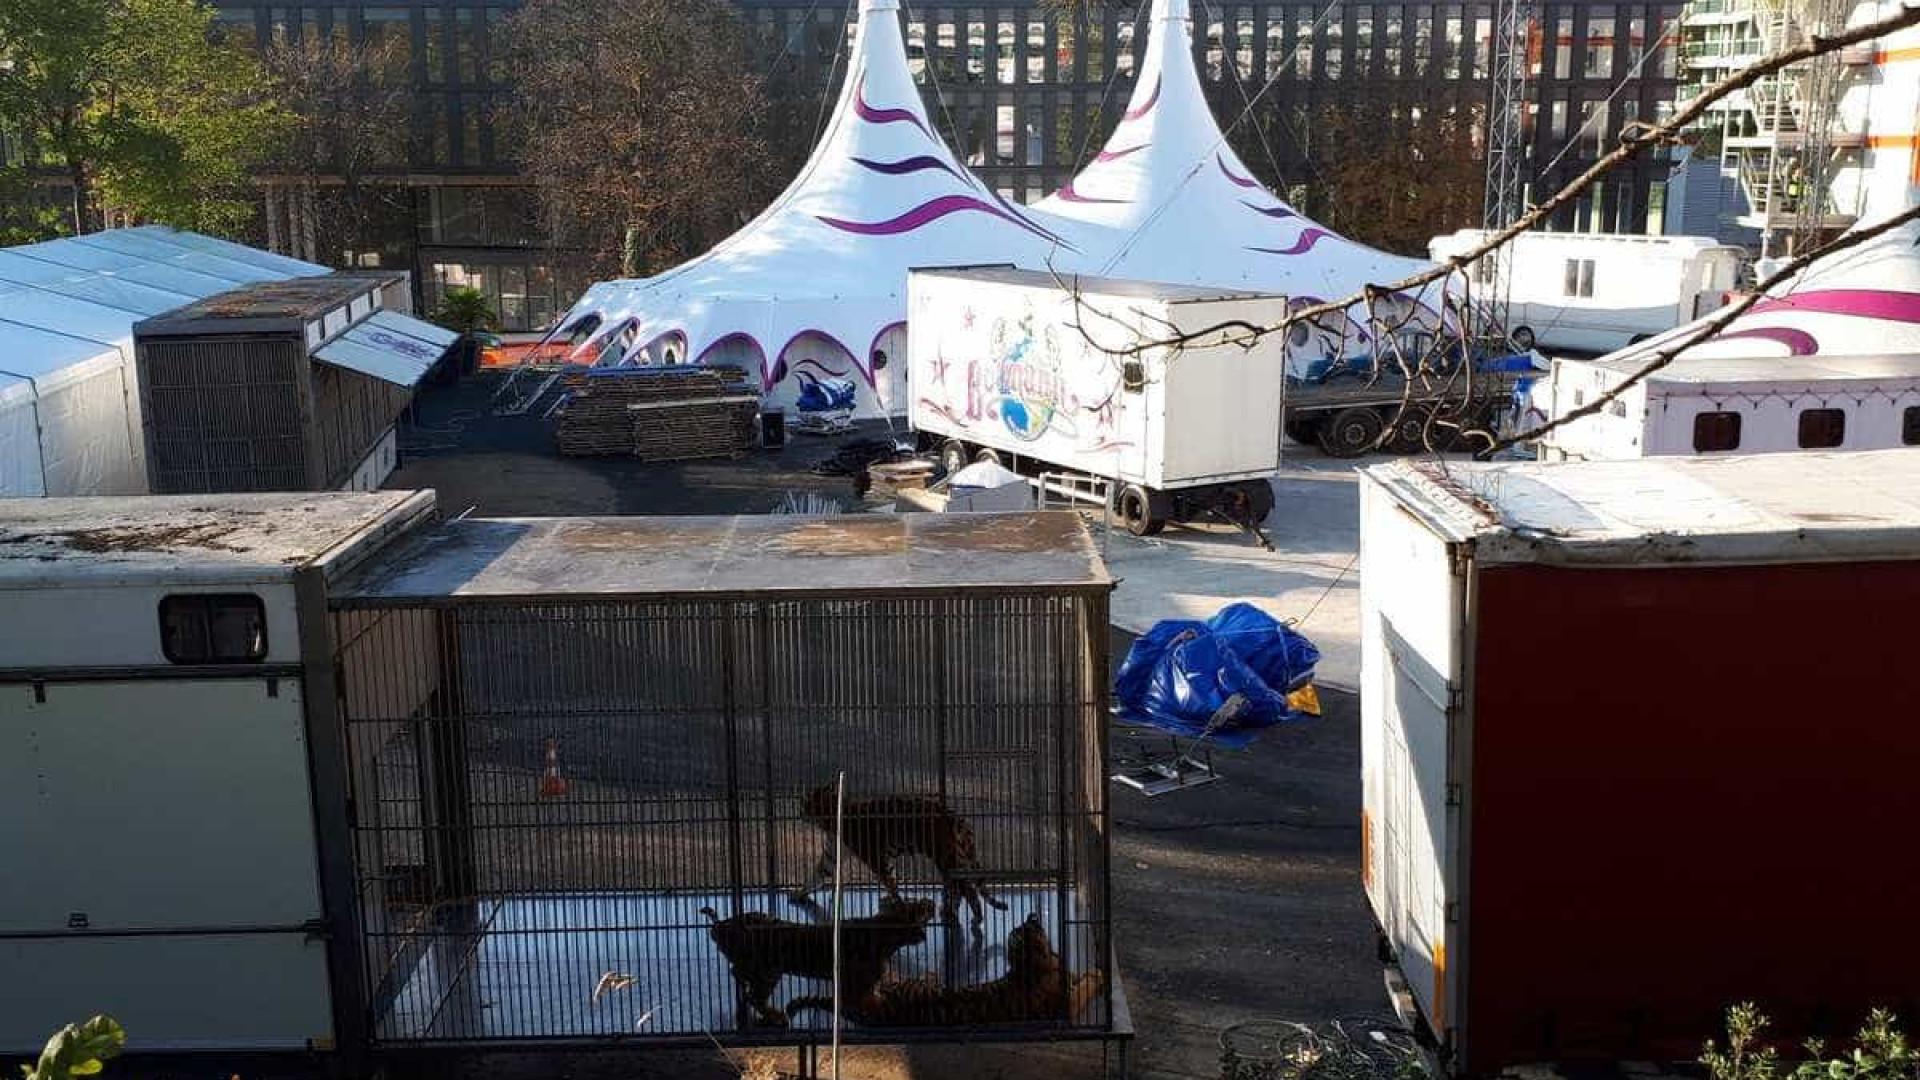 Tigre passeia por Paris após fugir de circo e acaba sendo abatido